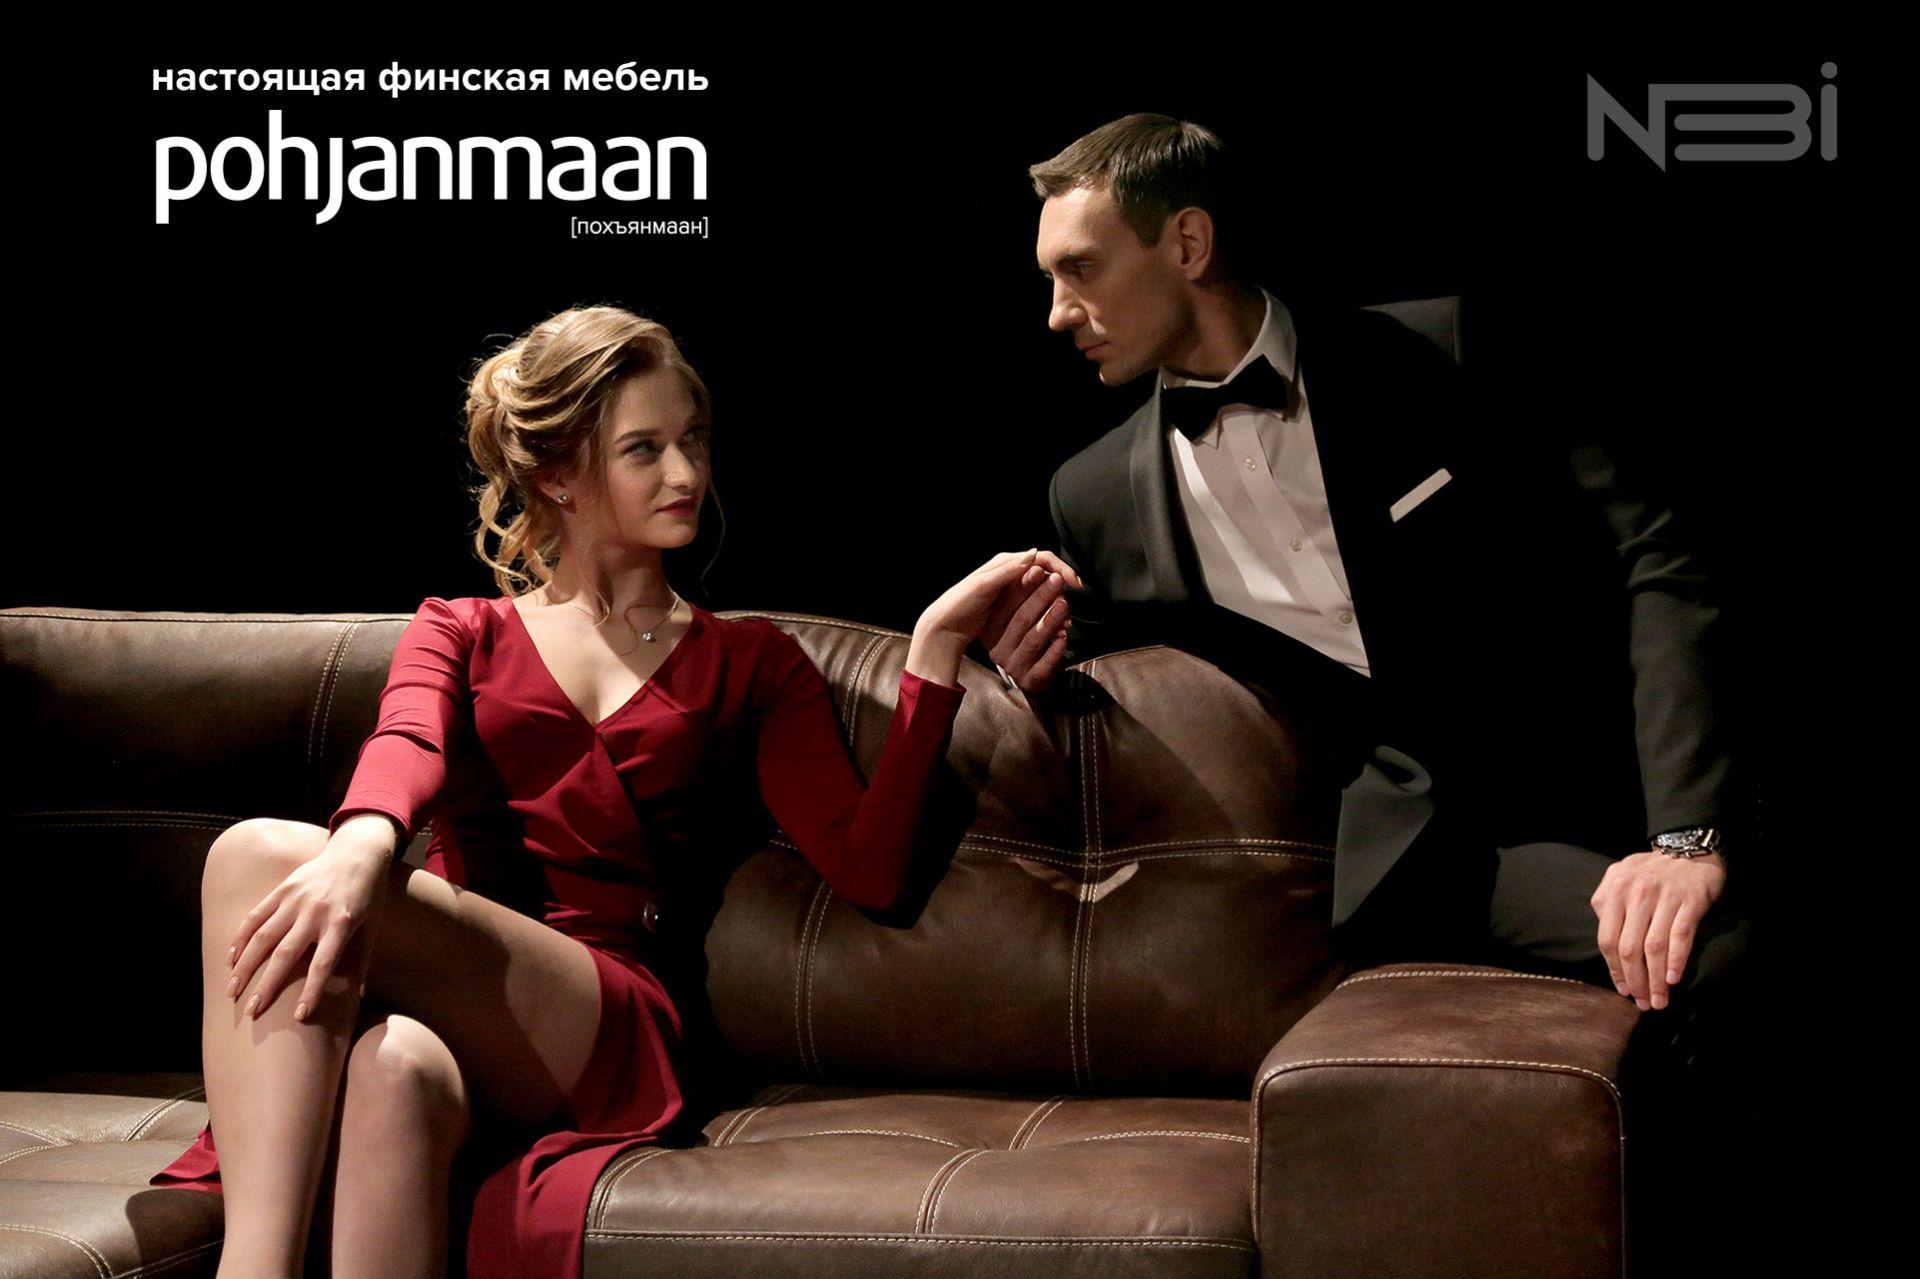 Фотостудия нби рекламная фотосъемка для компании pohjanmaan